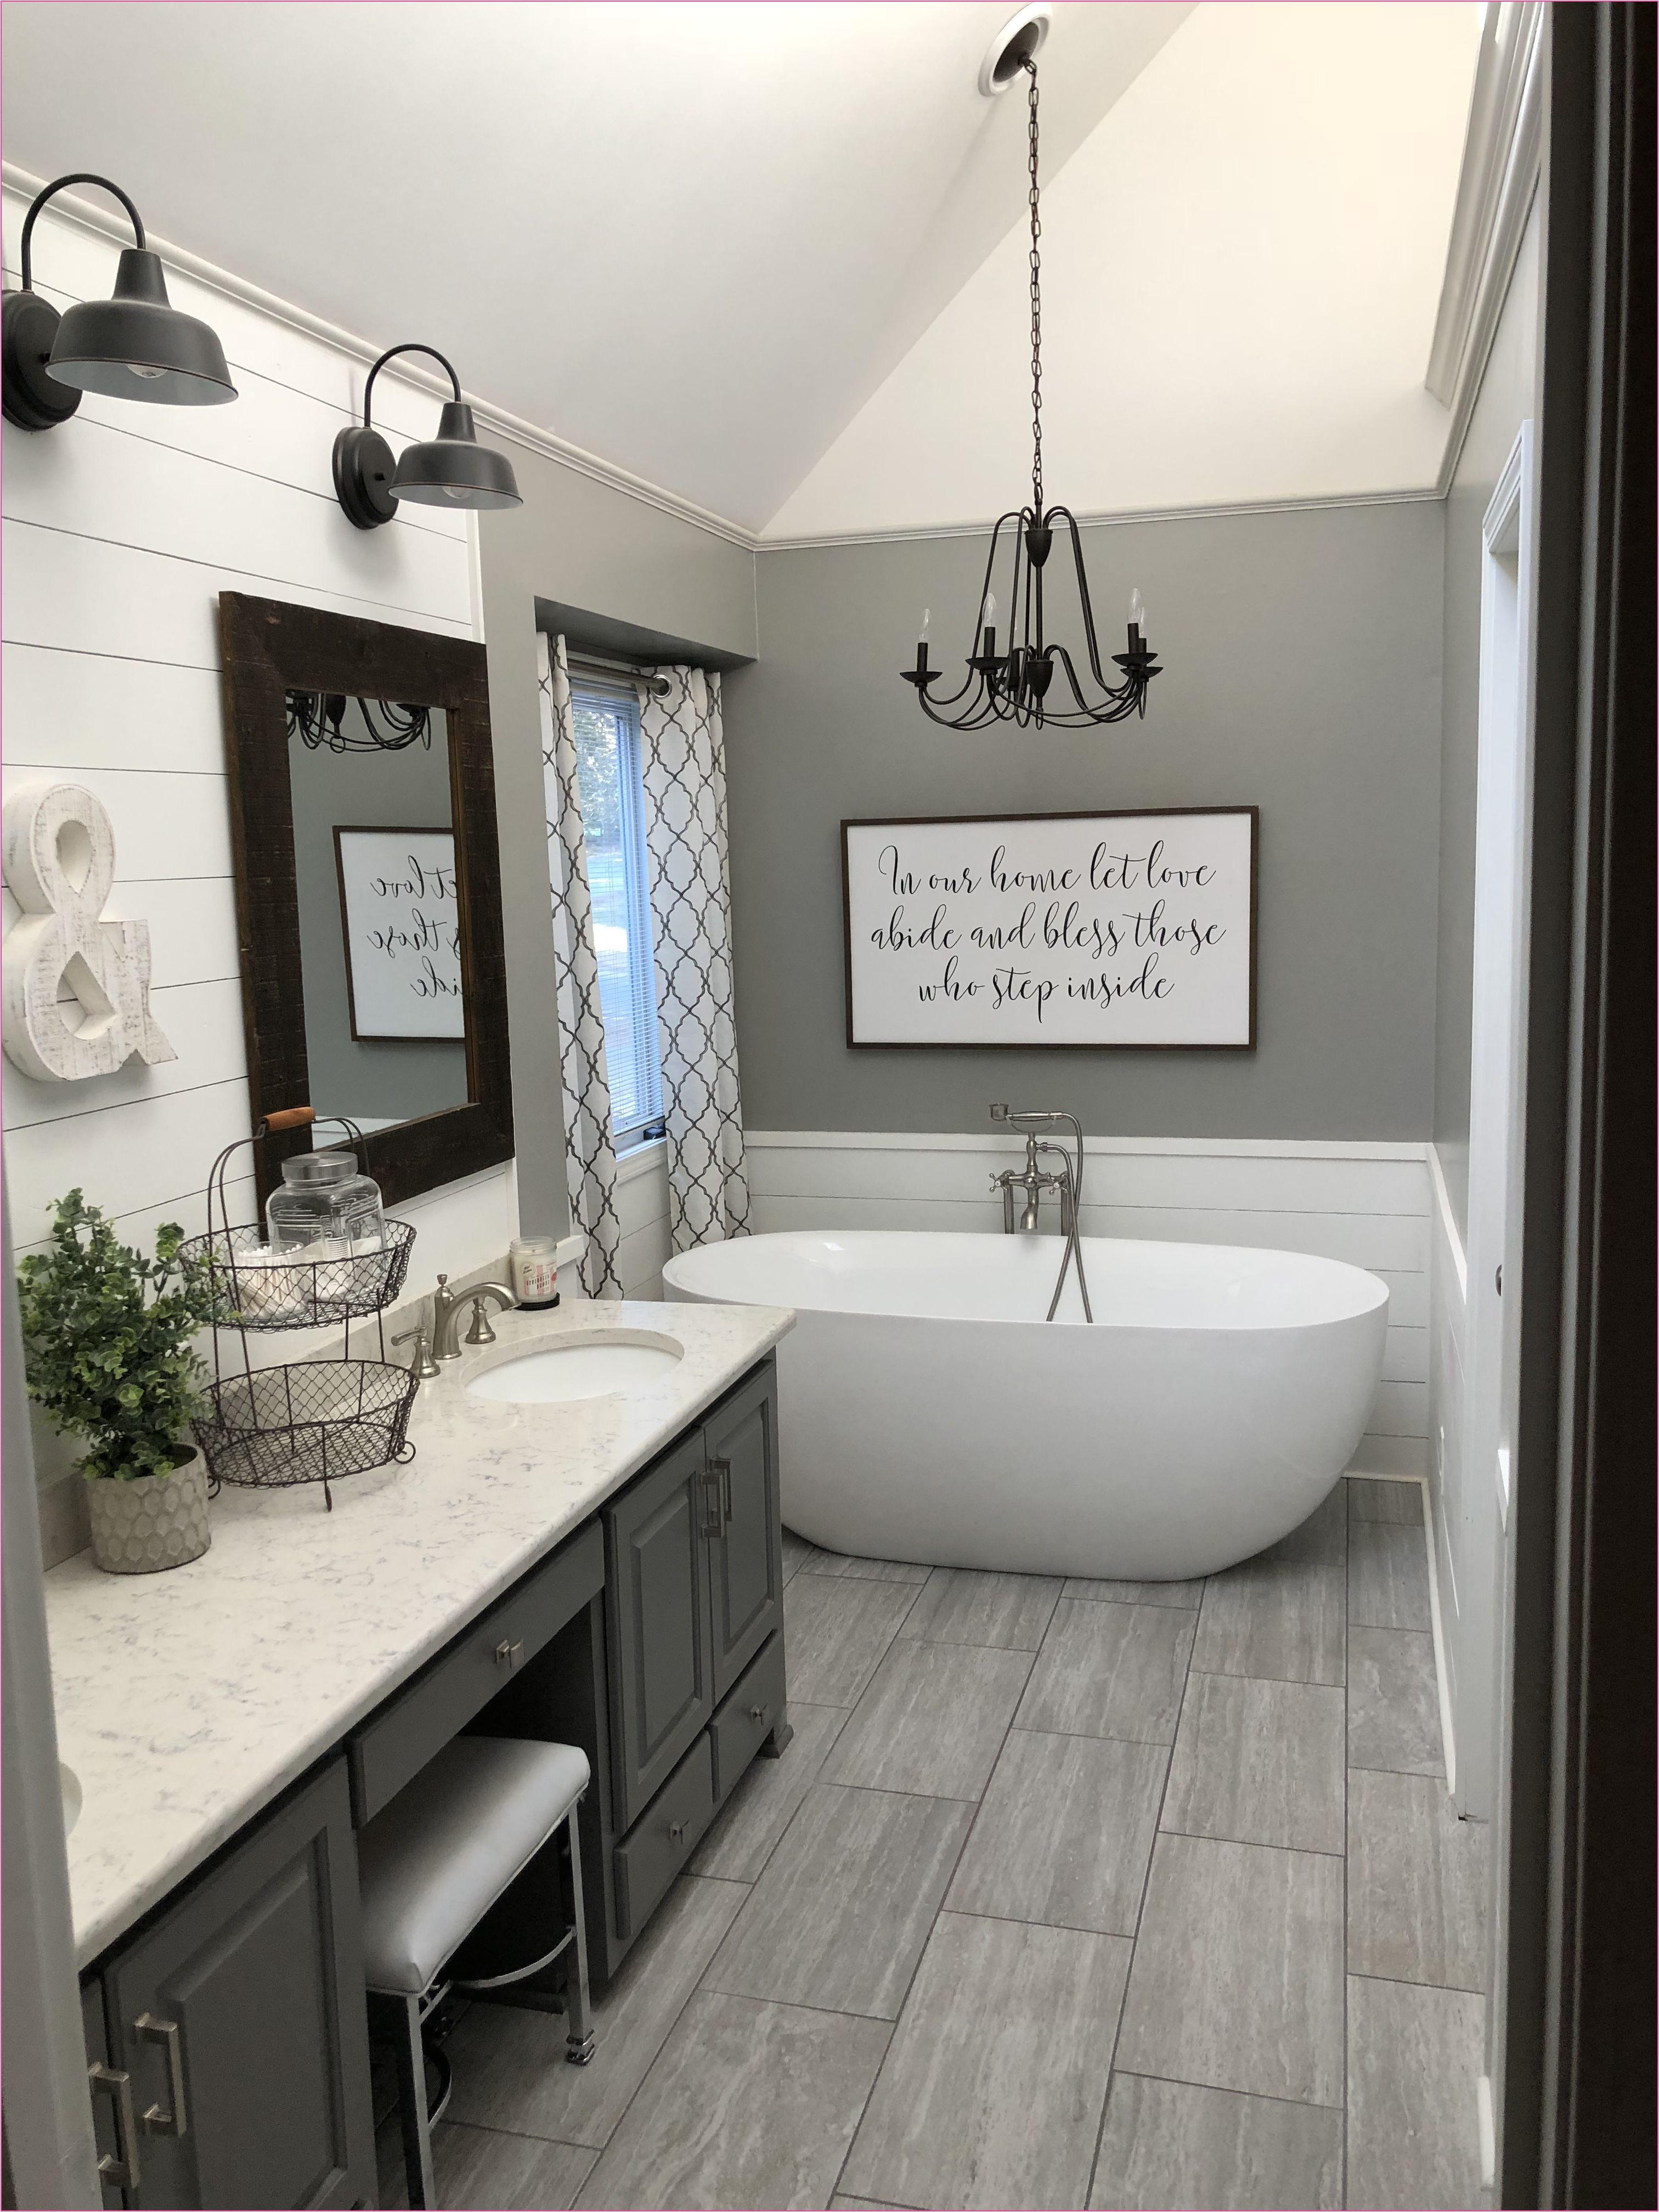 shiplap in bathroom moisture awesome 36 inspirational shiplap in bathroom moisture